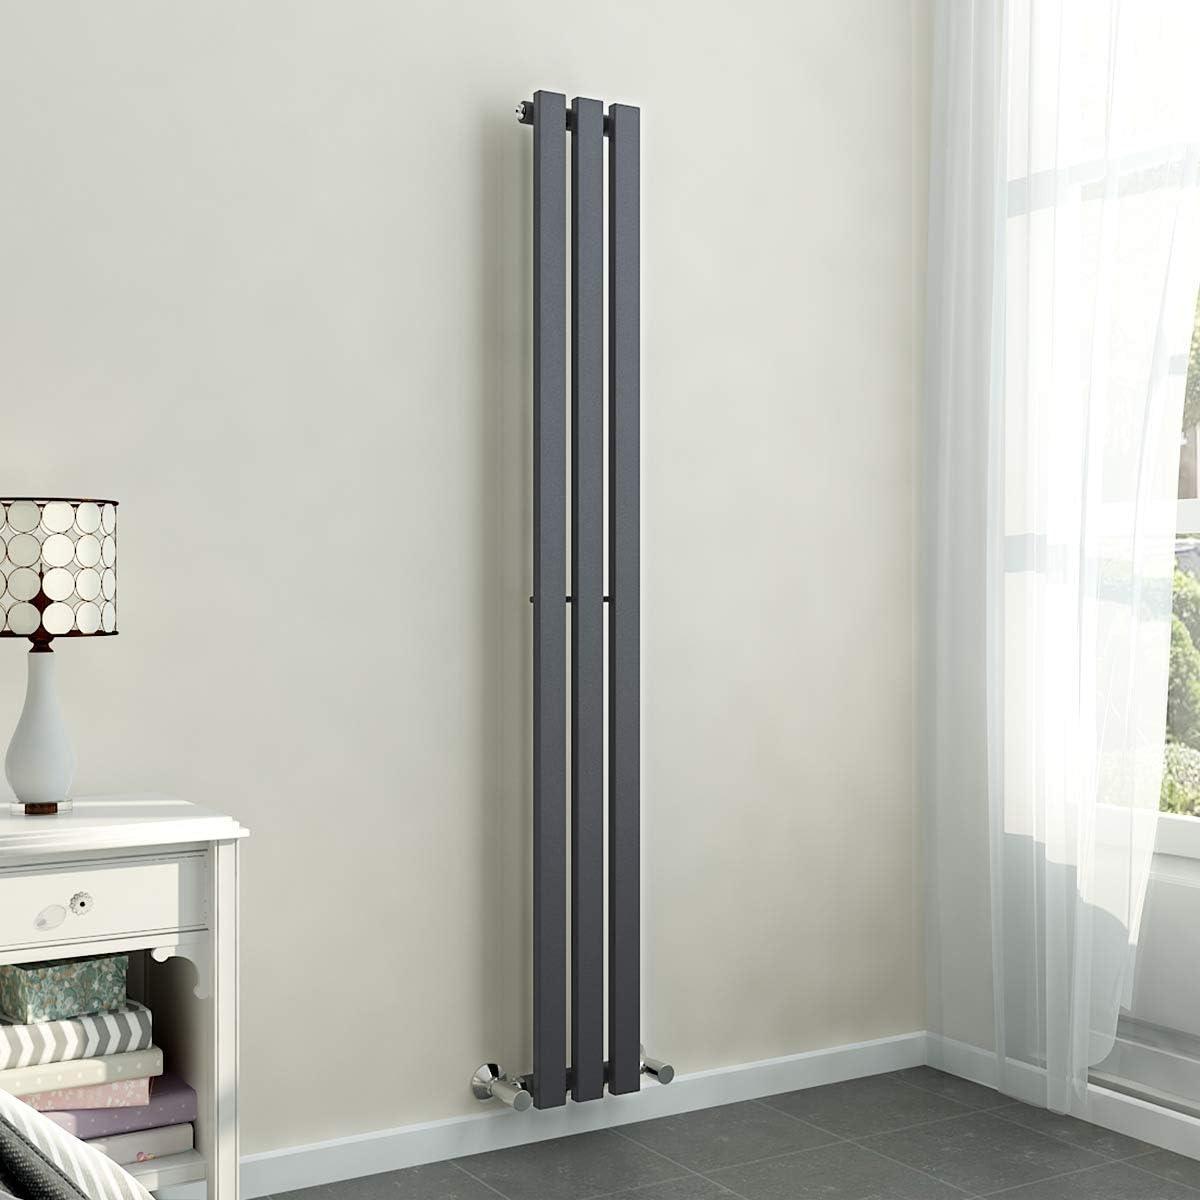 Kitchen Modern Central Heating Living Room Perfect for Bathroom Warmehaus 1800 x 410 mm Grey Anthracite Vertical Designer Radiator Single Rectangular Flat Panel